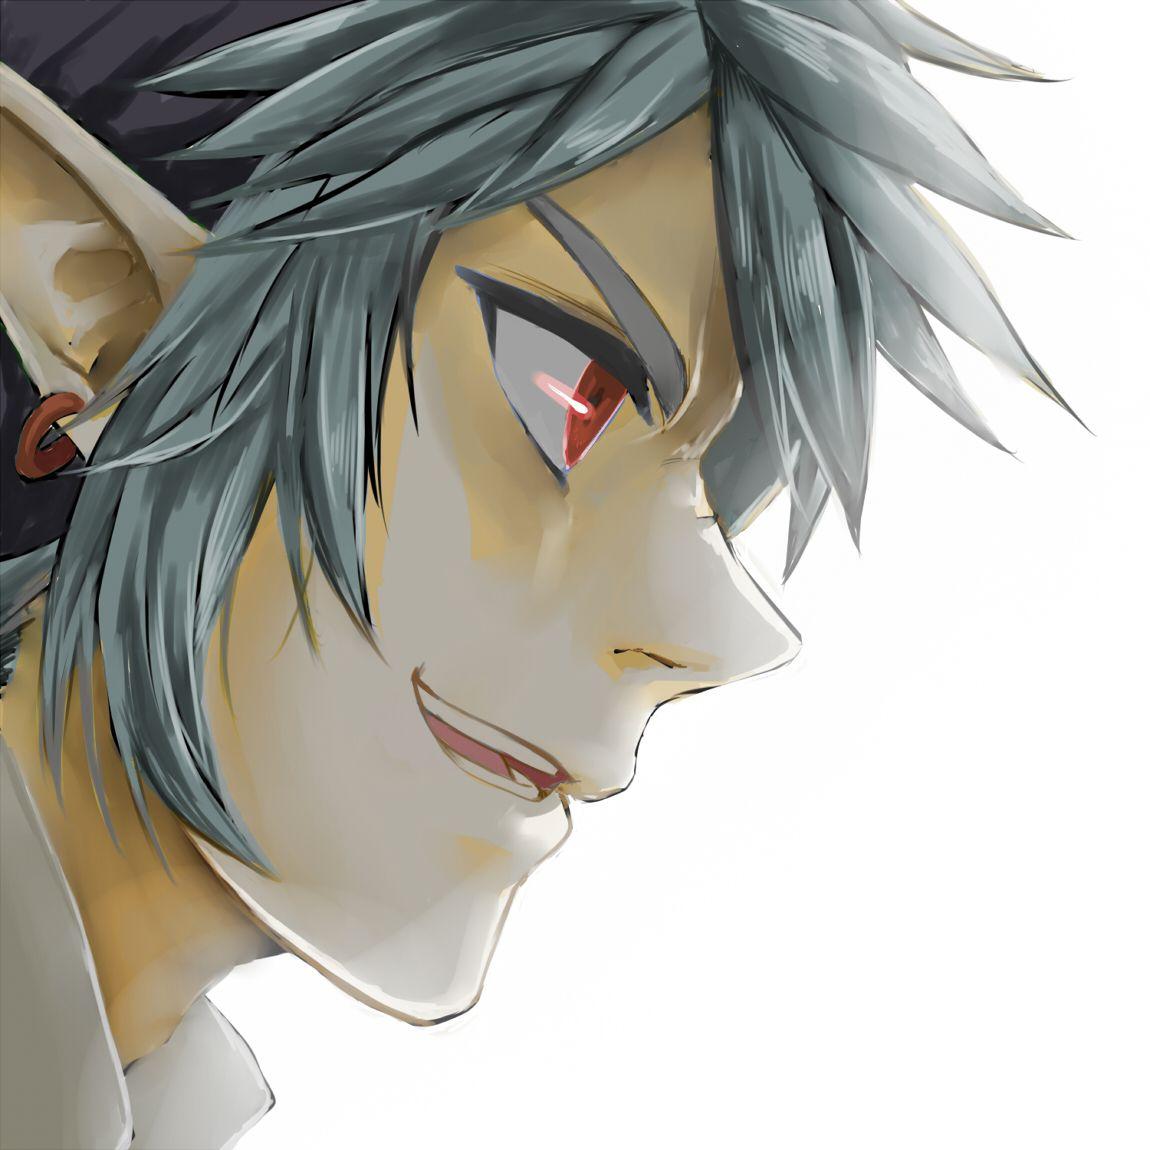 o////o.....I have a HUGE crush on Dark Link